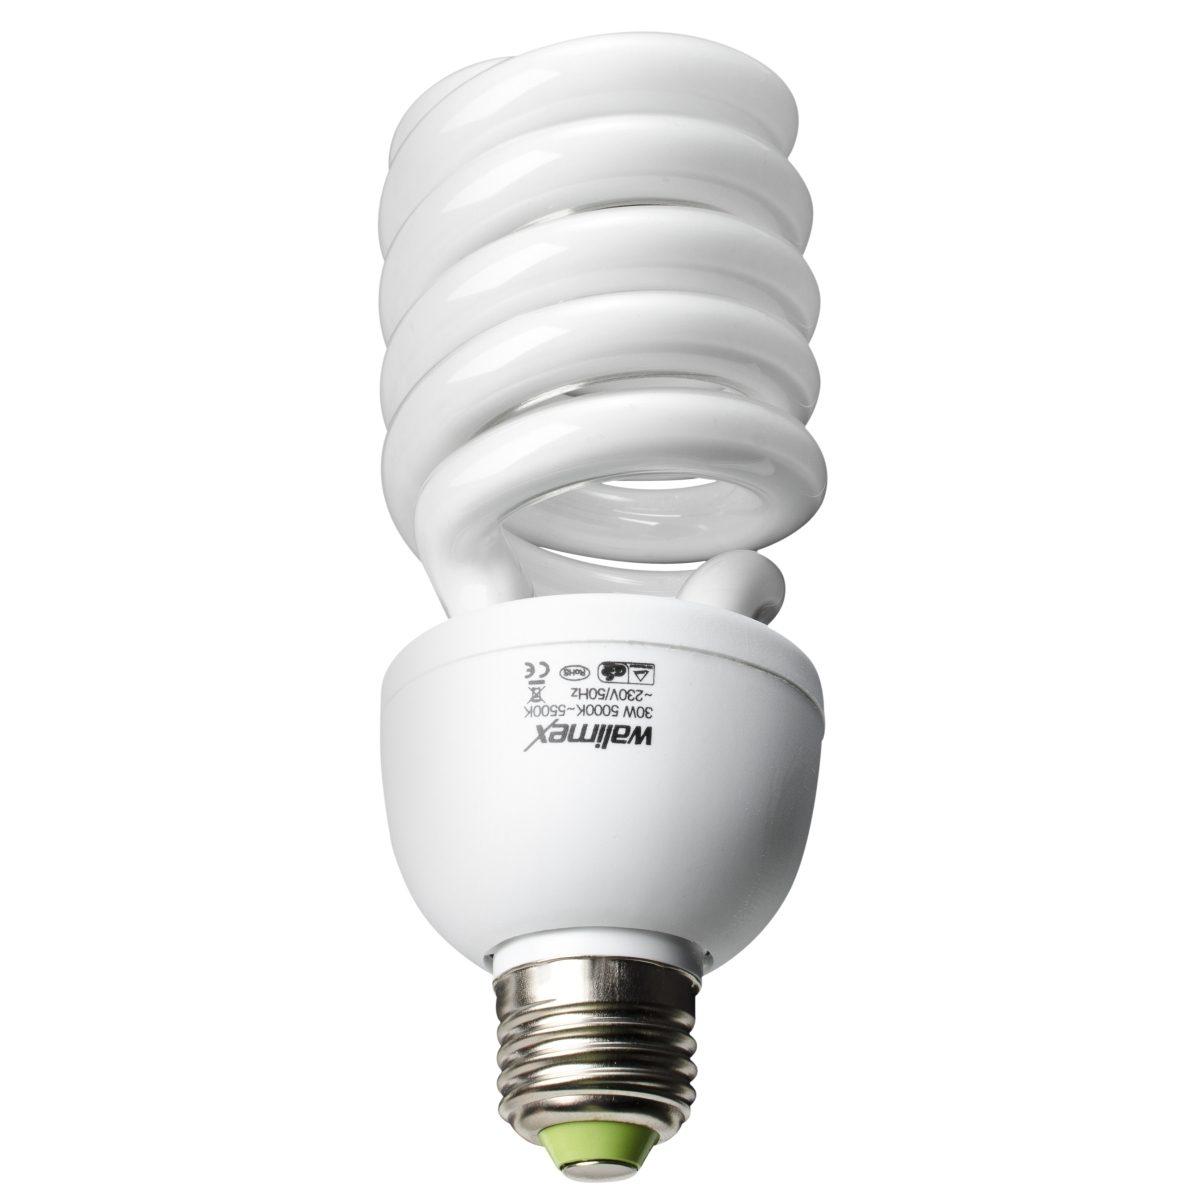 Walimex Spiral Daylight Lamp 16W equates 90W